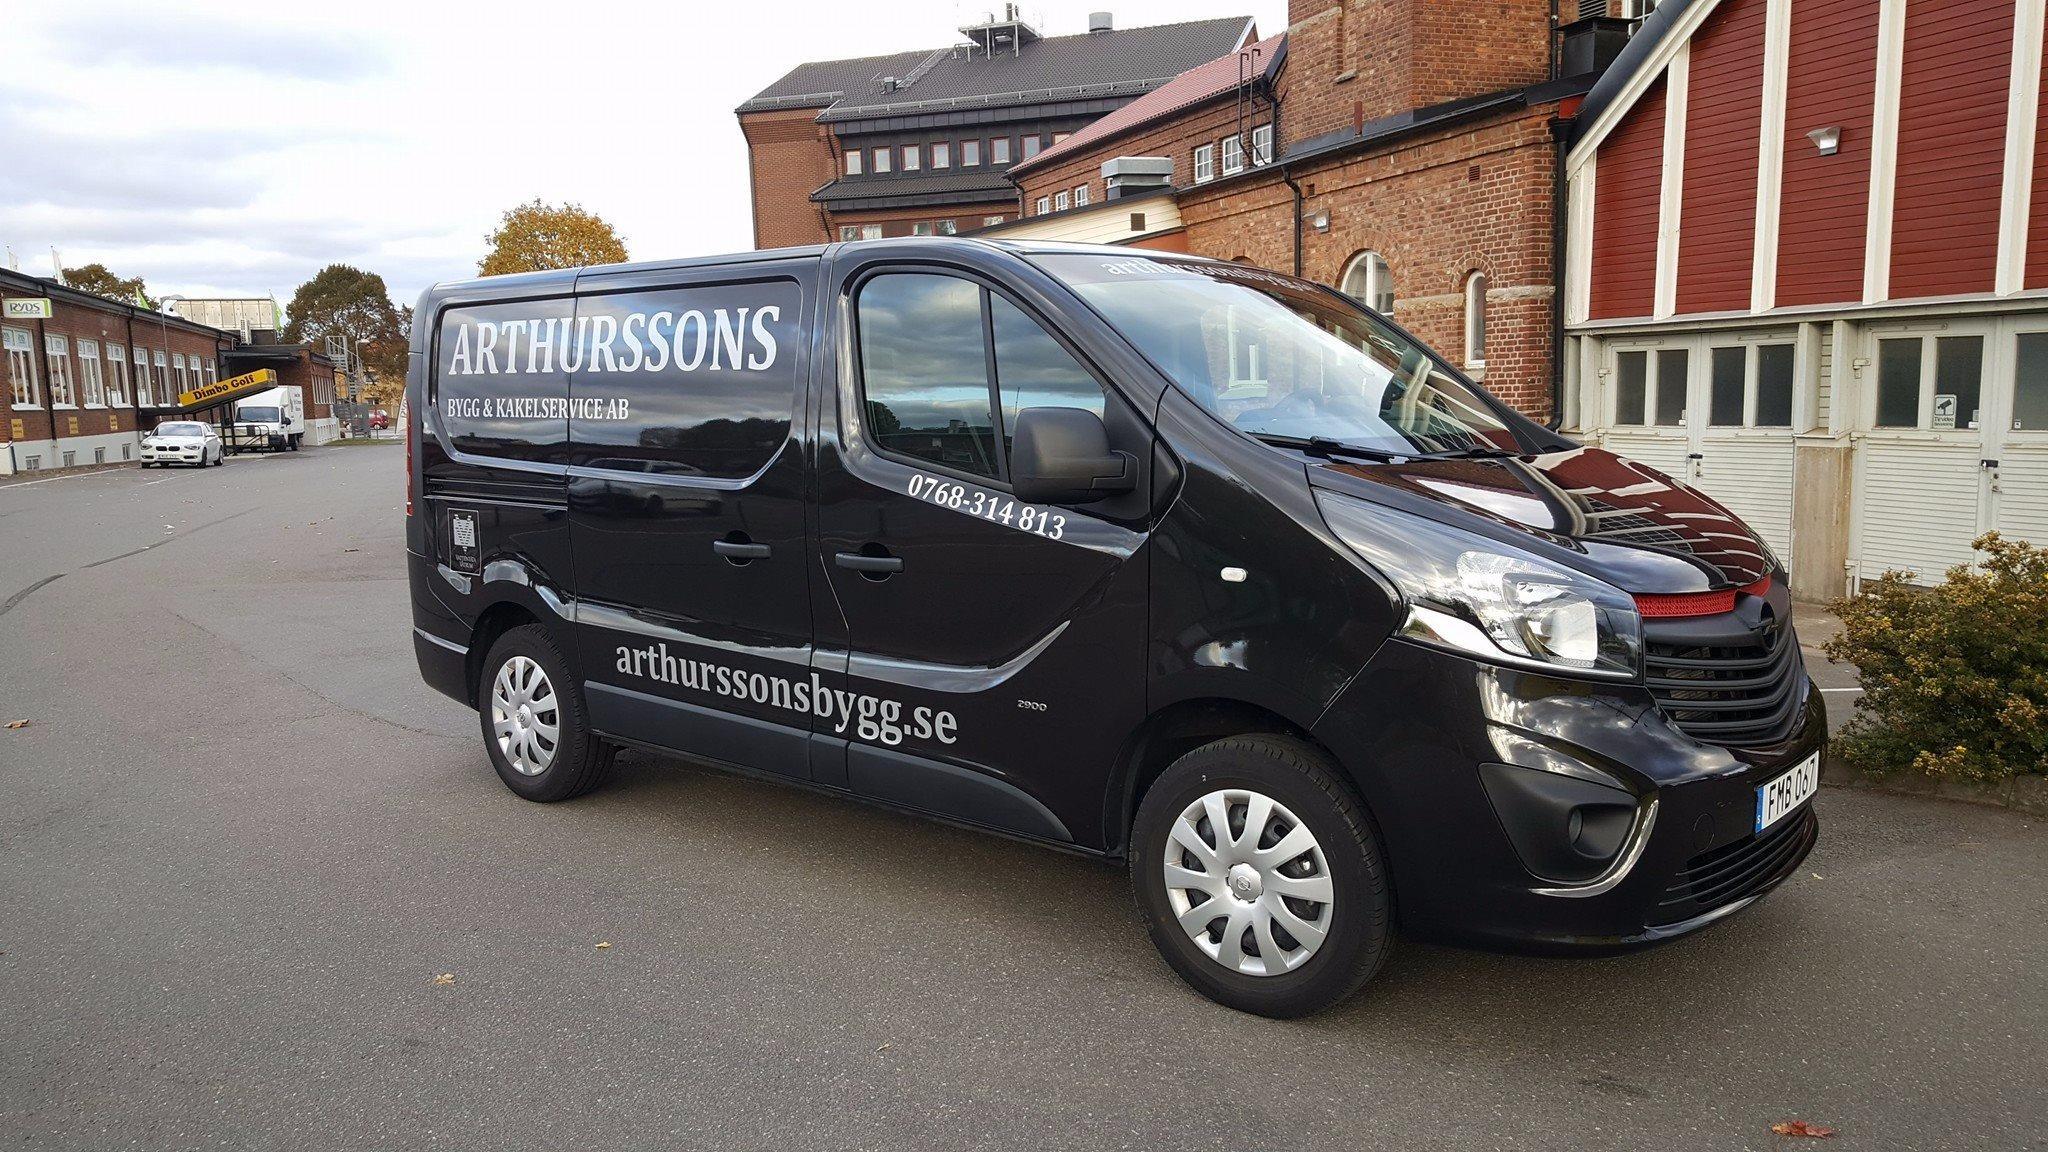 Arthurssons Bygg & Kakel Service AB